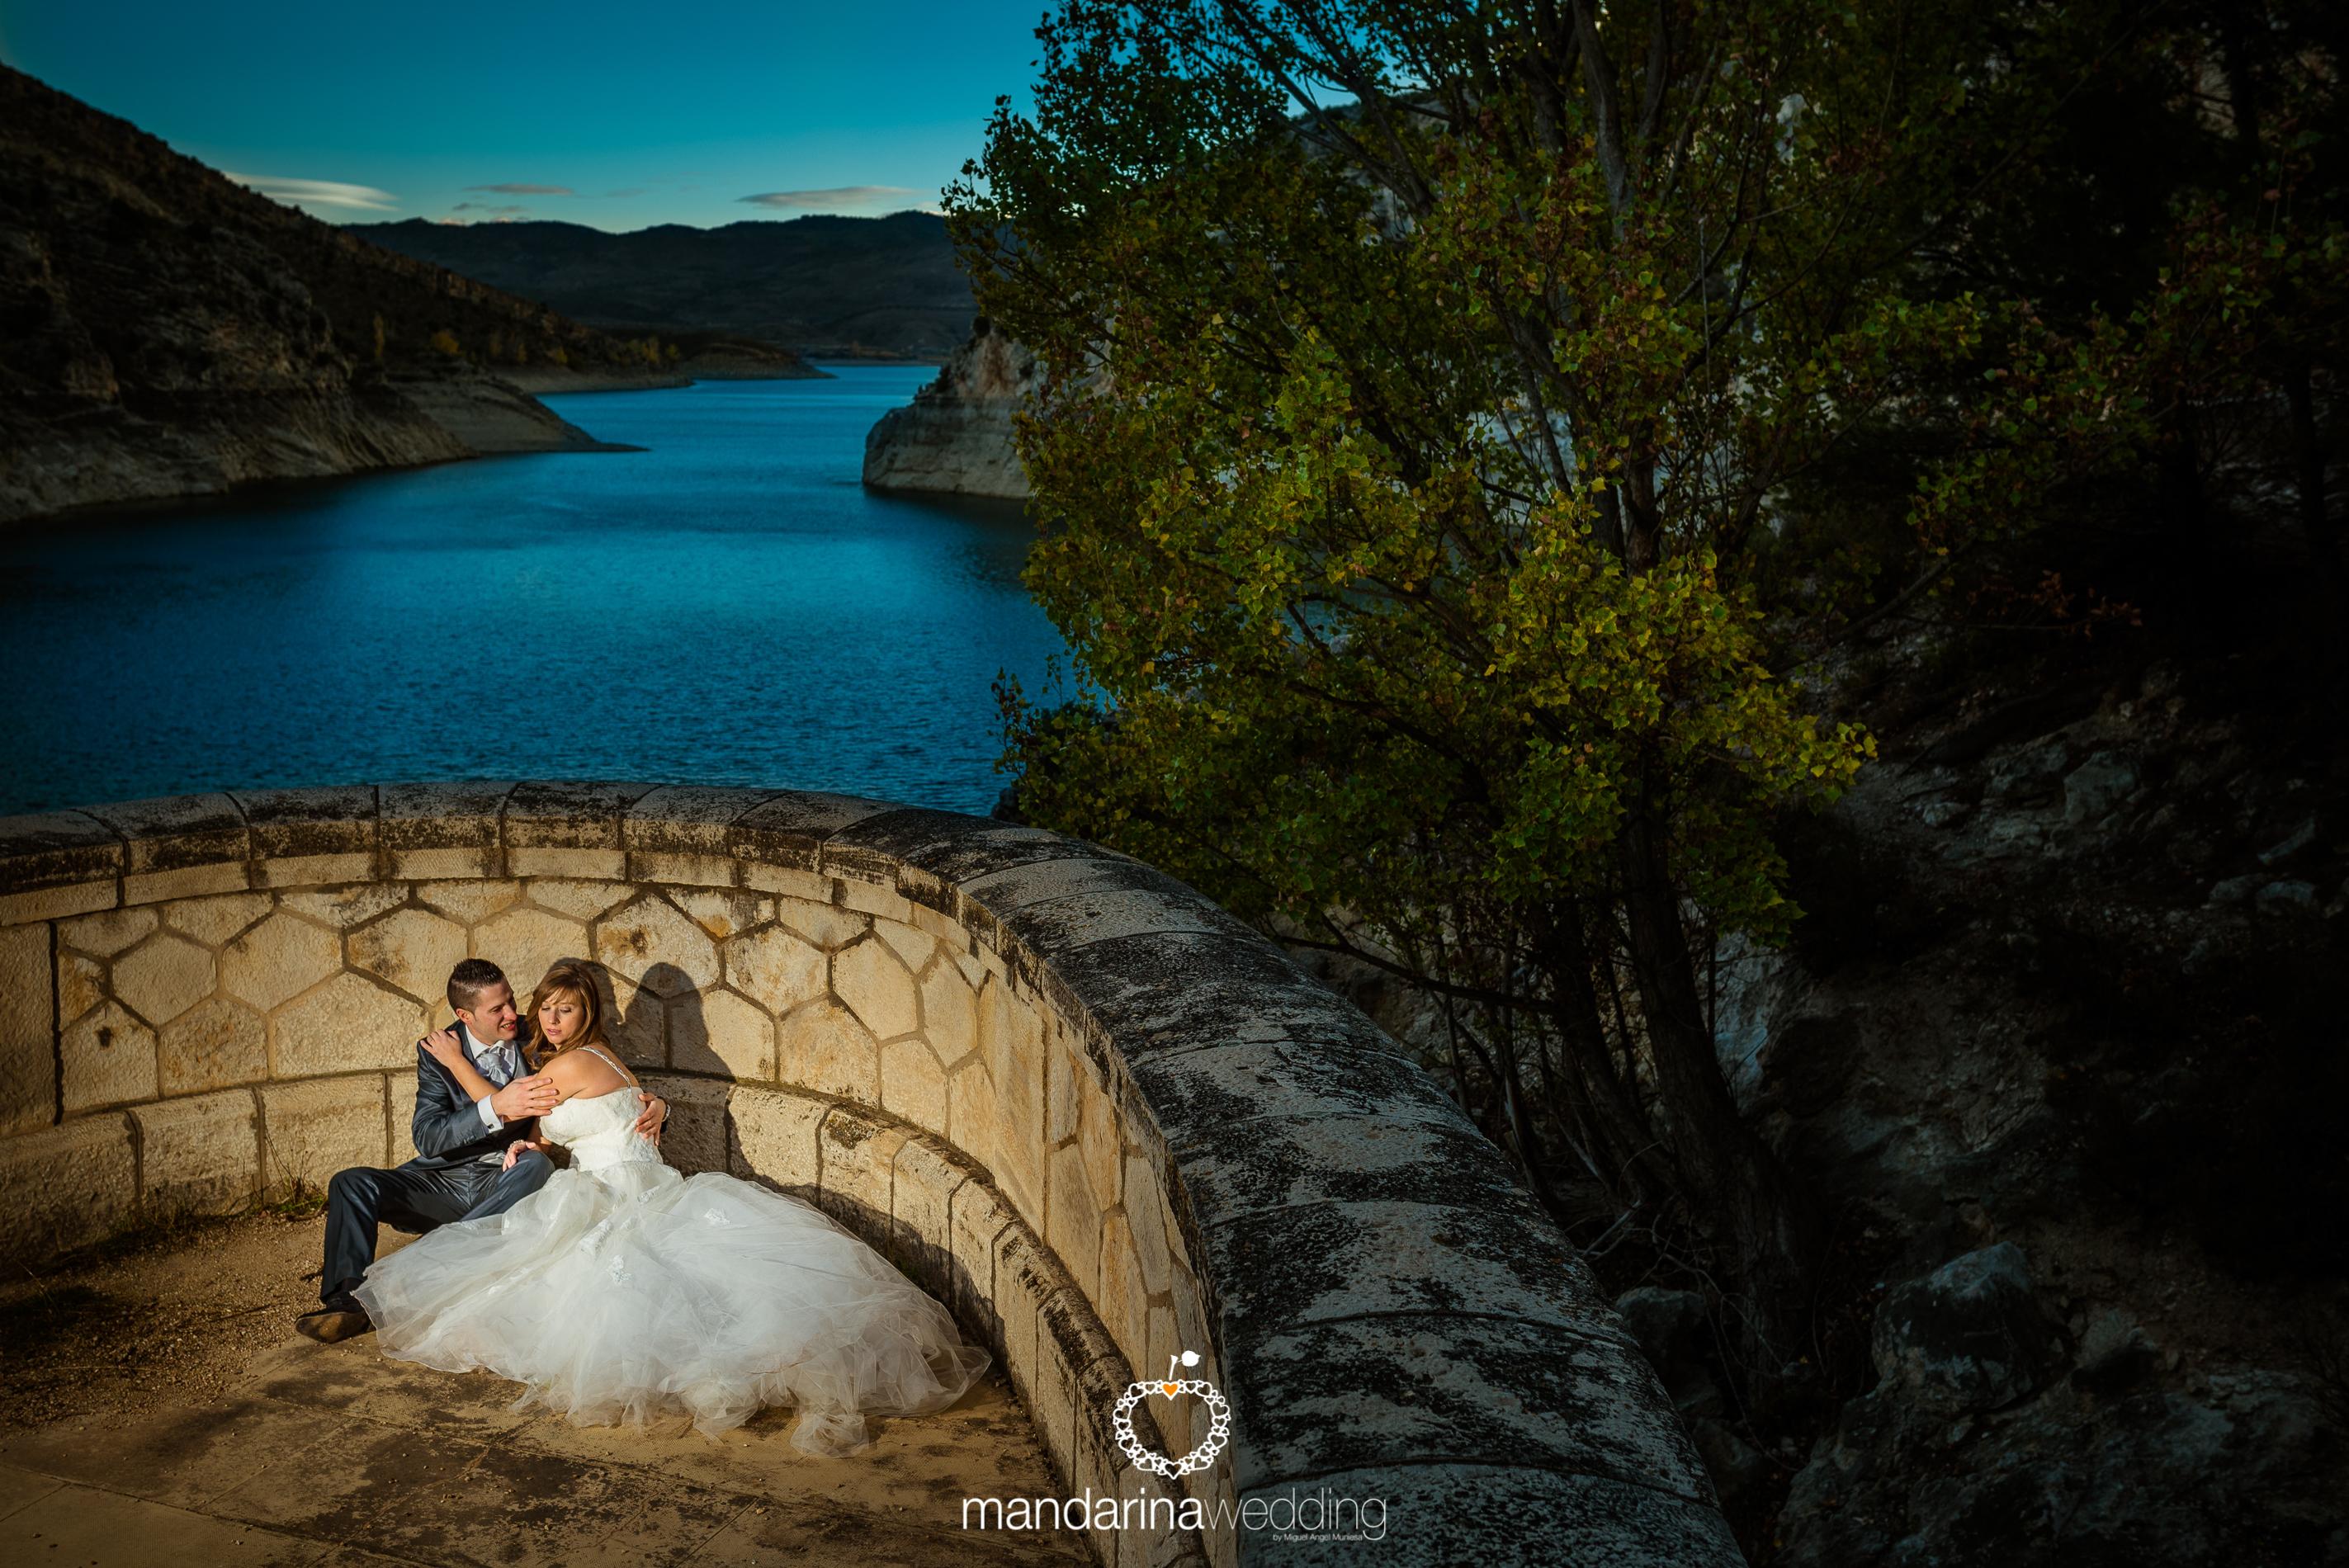 mandarina wedding, fotogarfos boda zaragoza, postboda, postboda en oliete, fotografos boda teruel, fotografos huesca_08